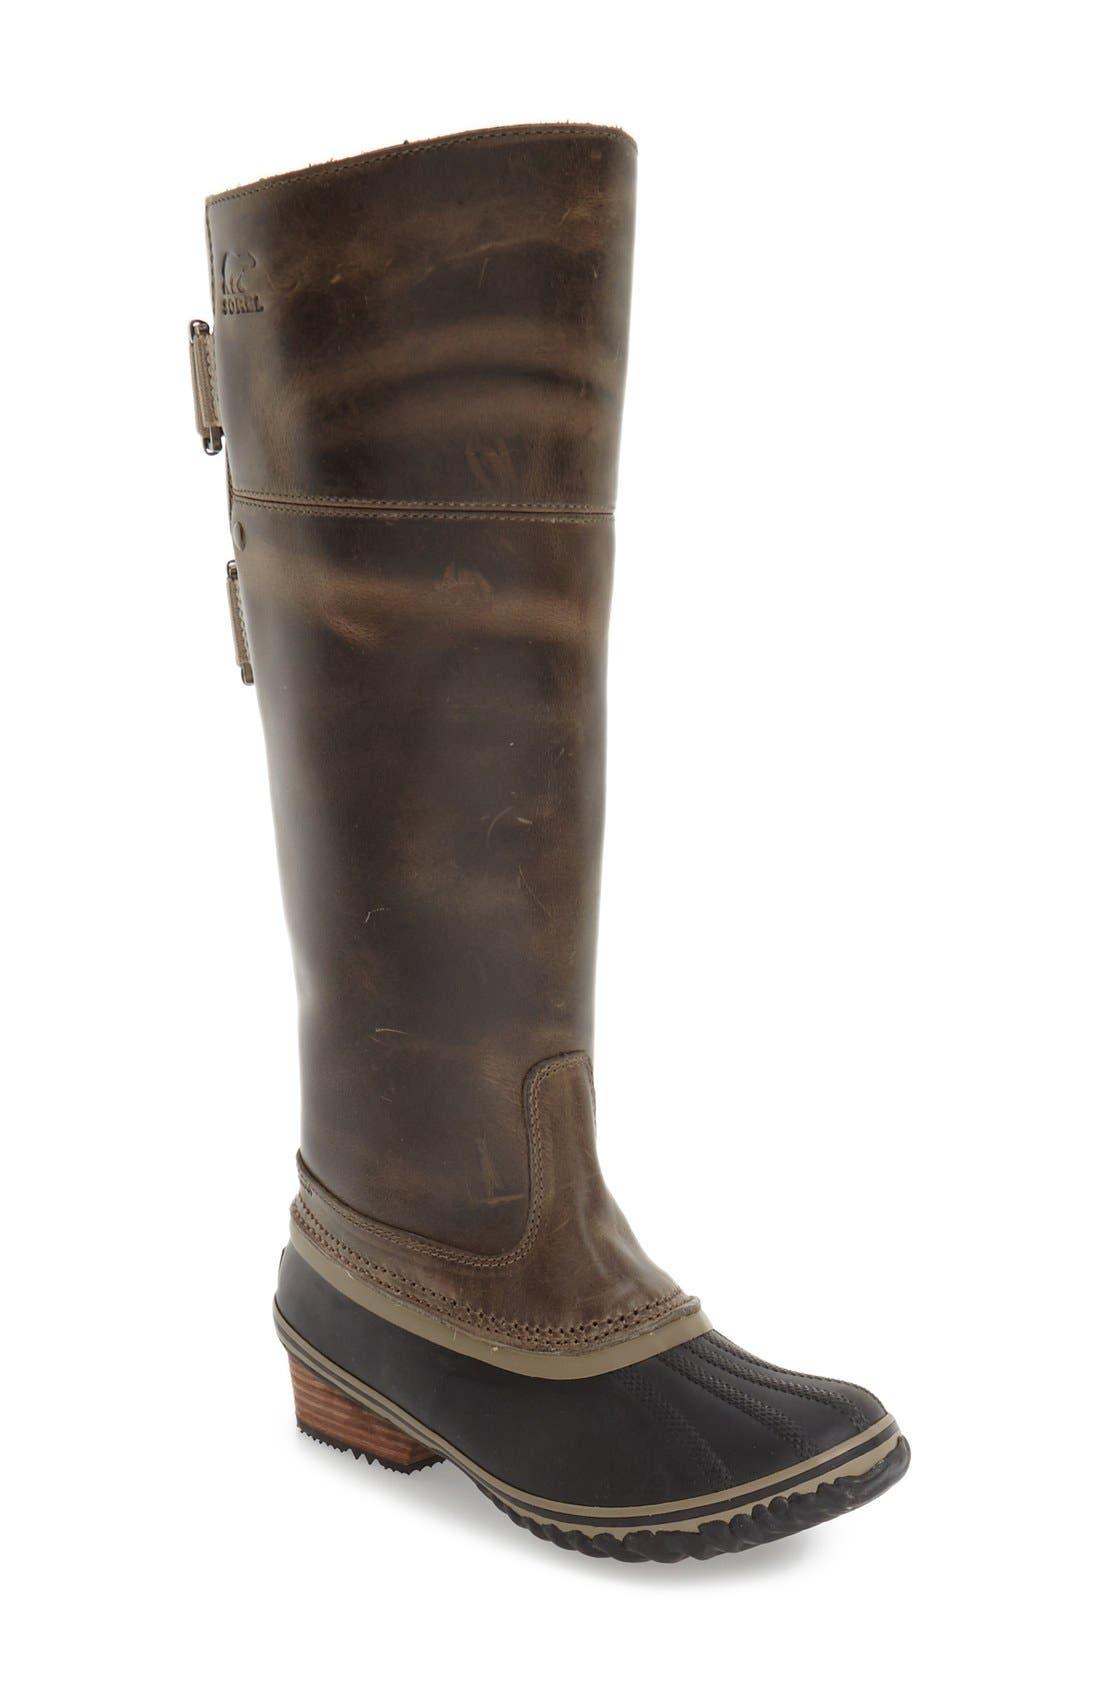 Alternate Image 1 Selected - SOREL 'Slimpack II' Waterproof Riding Boot (Women)